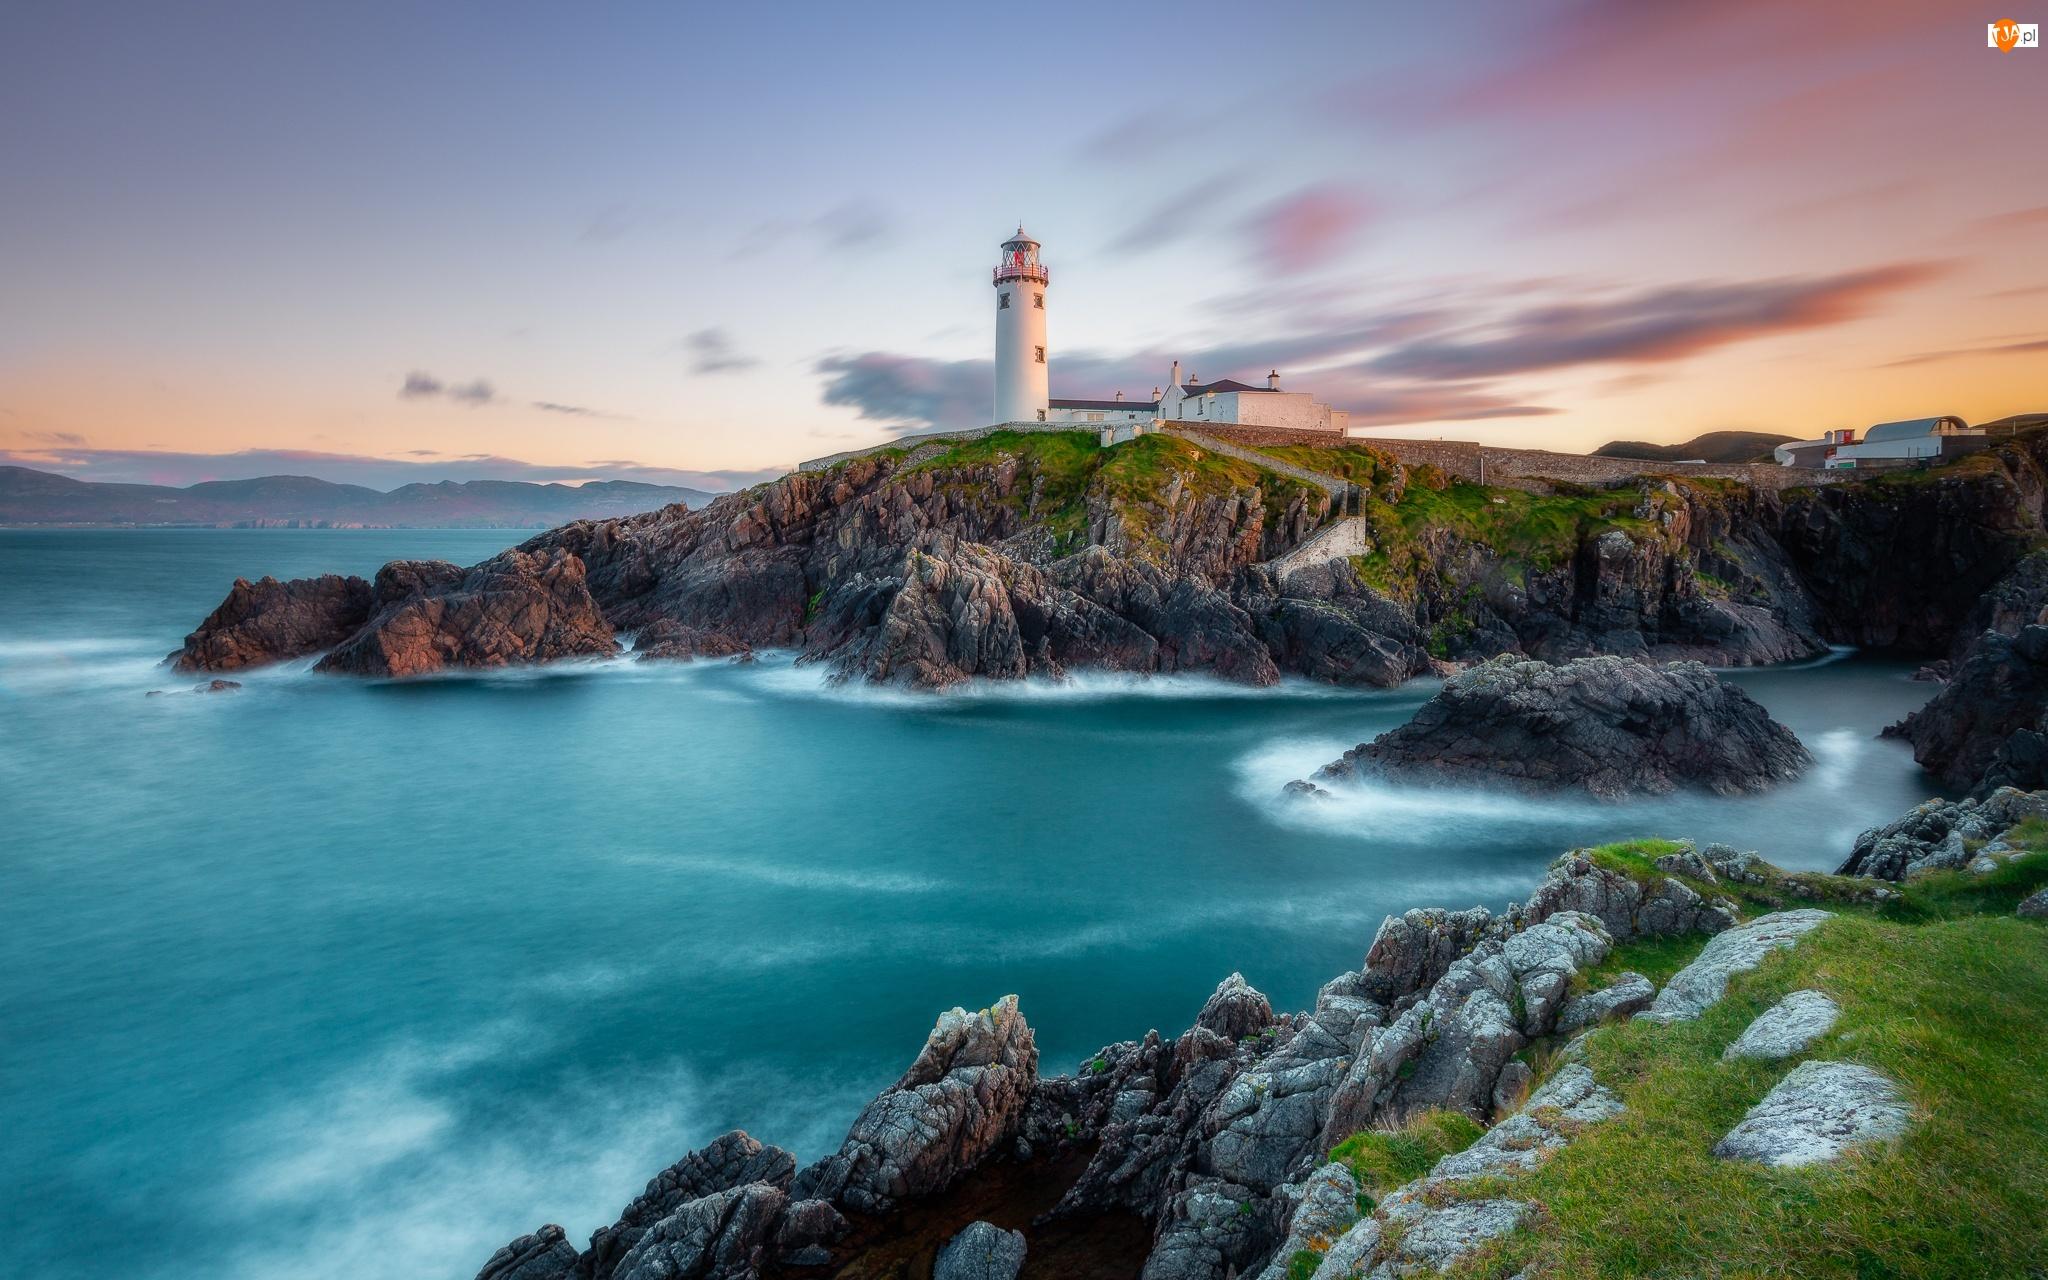 Chmury, Morze, Skały, Portsalon, Latarnia morska, Wschód słońca, Irlandia Północna, Fanad Head Lighthouse